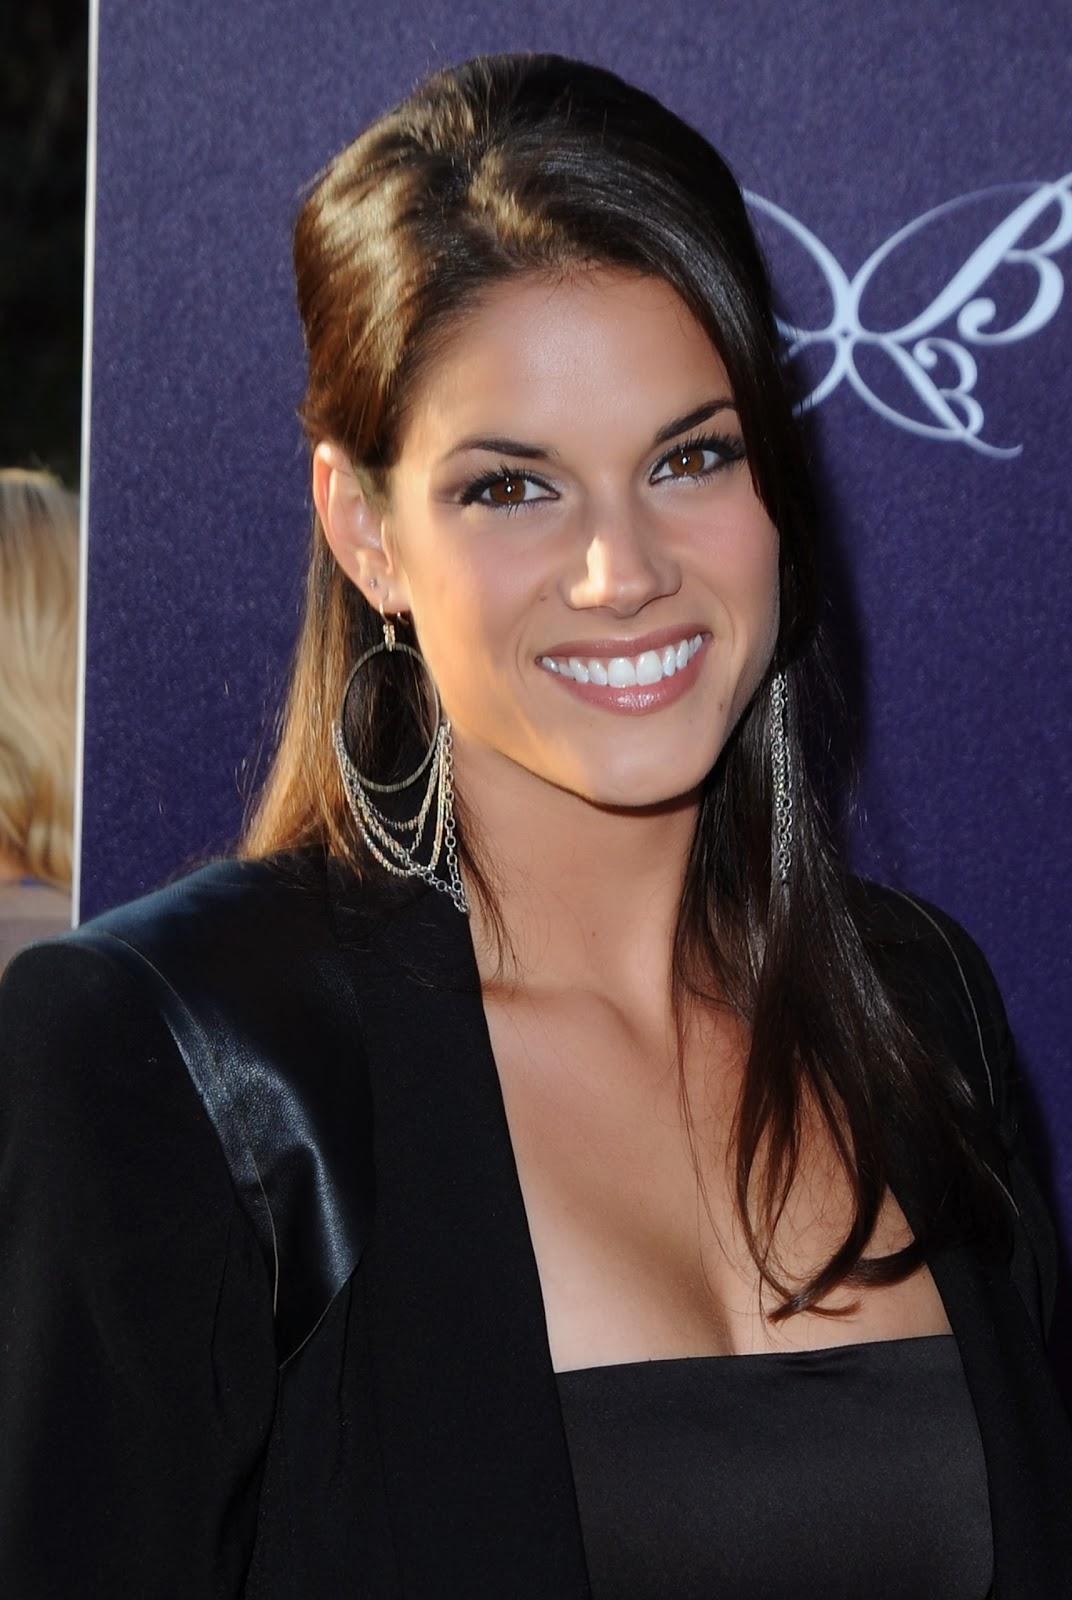 Model Missy Peregrym Hq Images  Hot Celebrity-4189